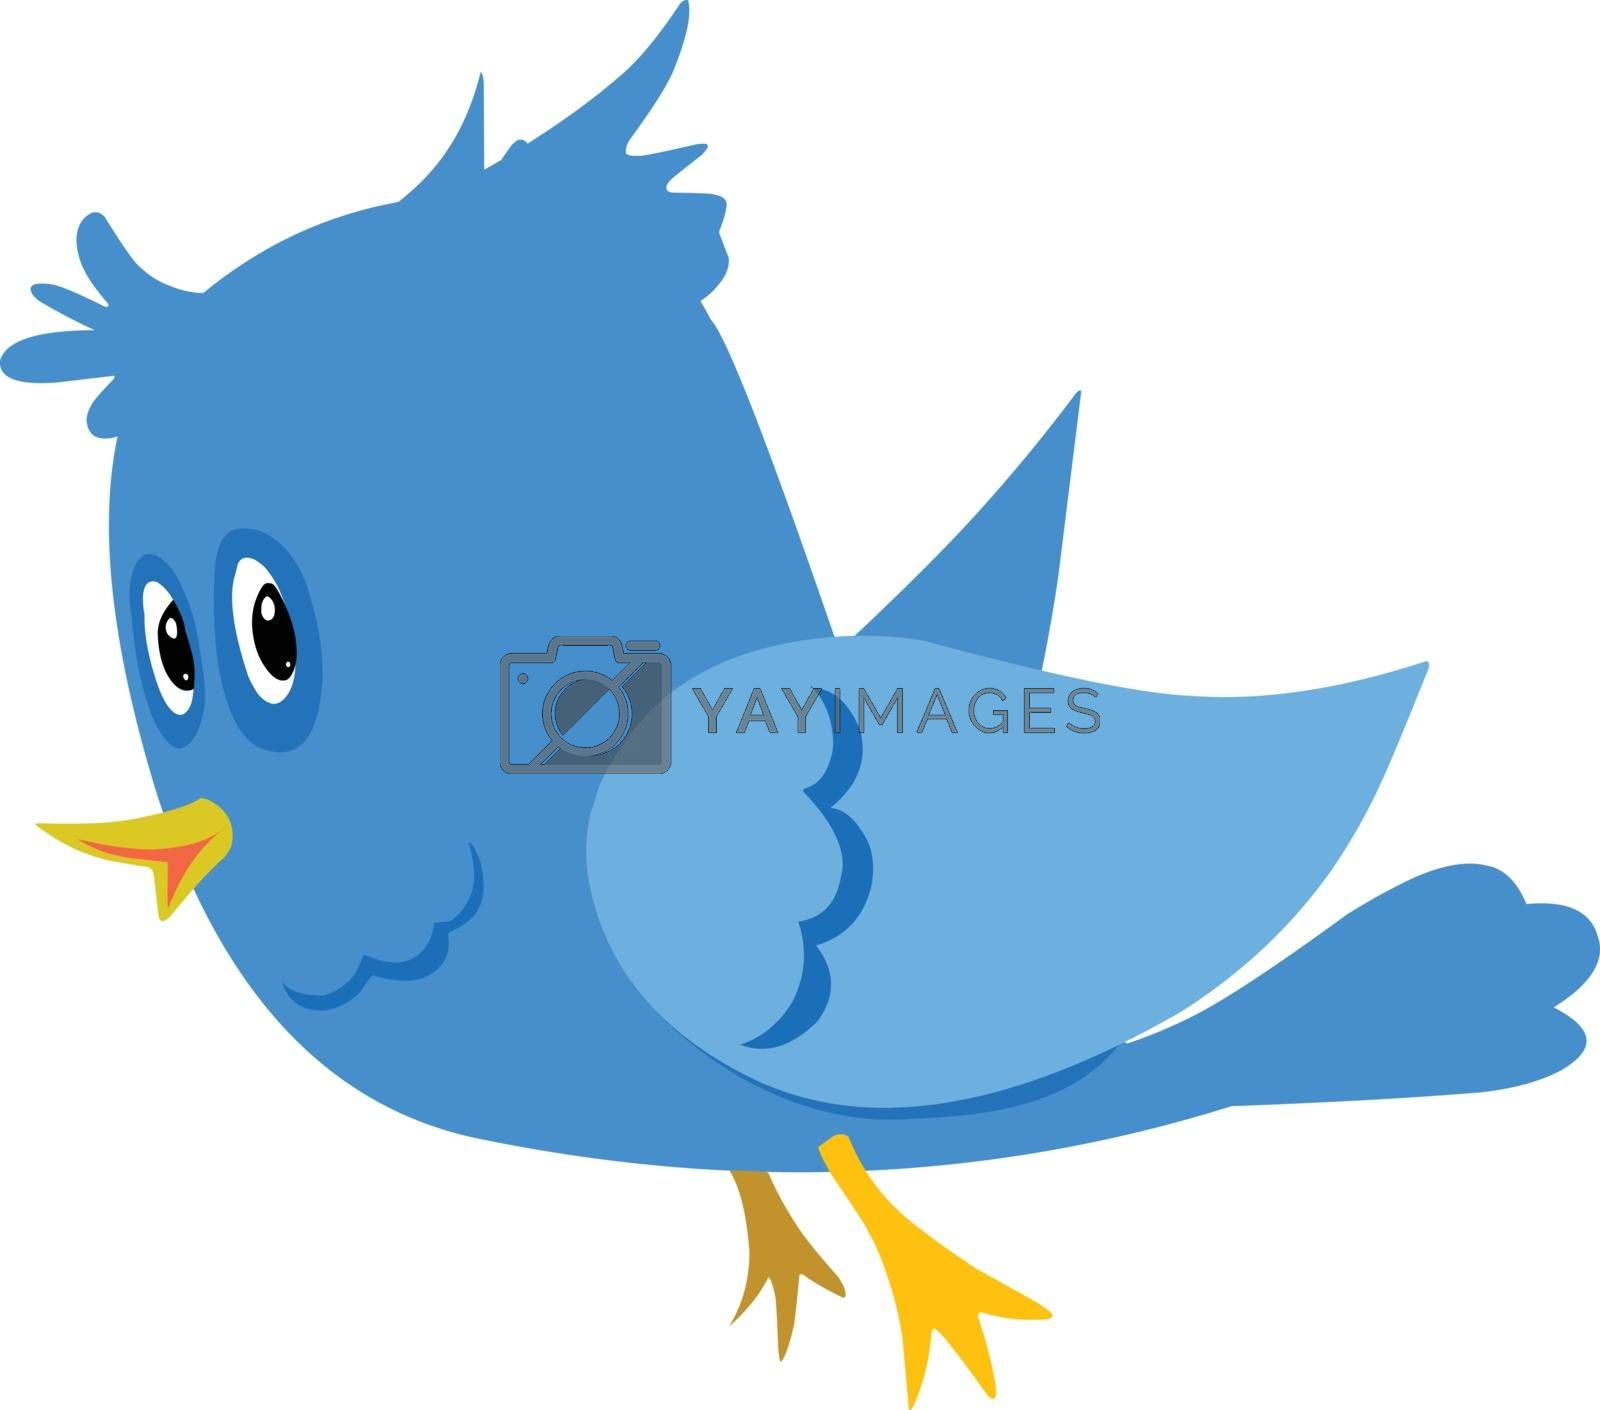 Stock Illustration Blue Cartoon Bird on a White Background